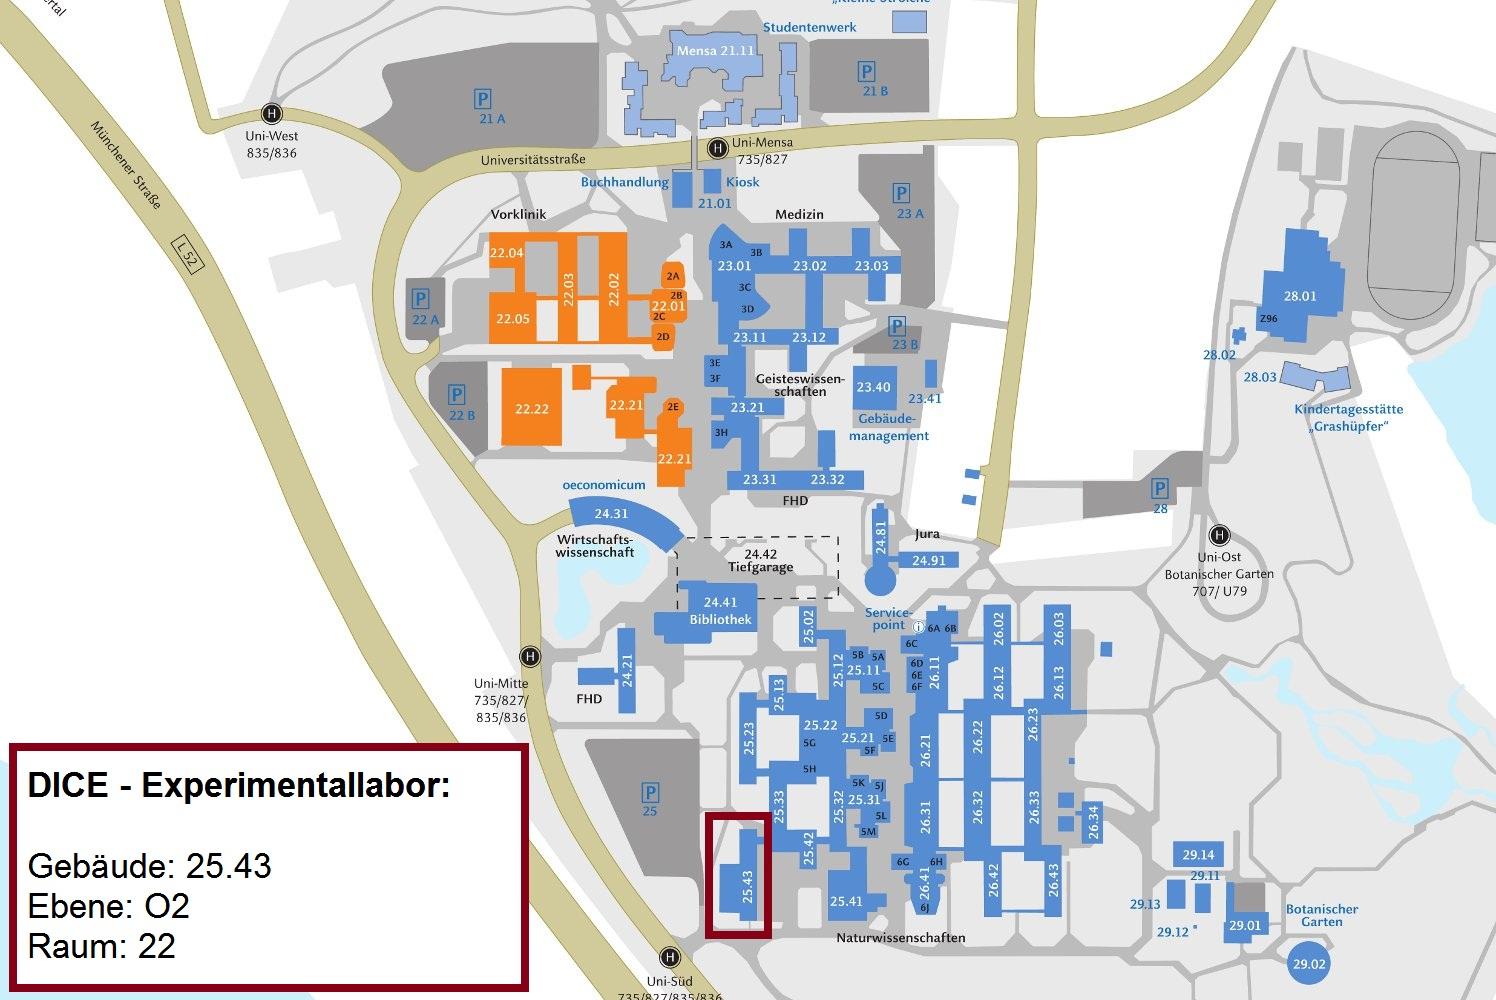 universitt dsseldorf dice labor - Dsseldorf Uni Bewerbung